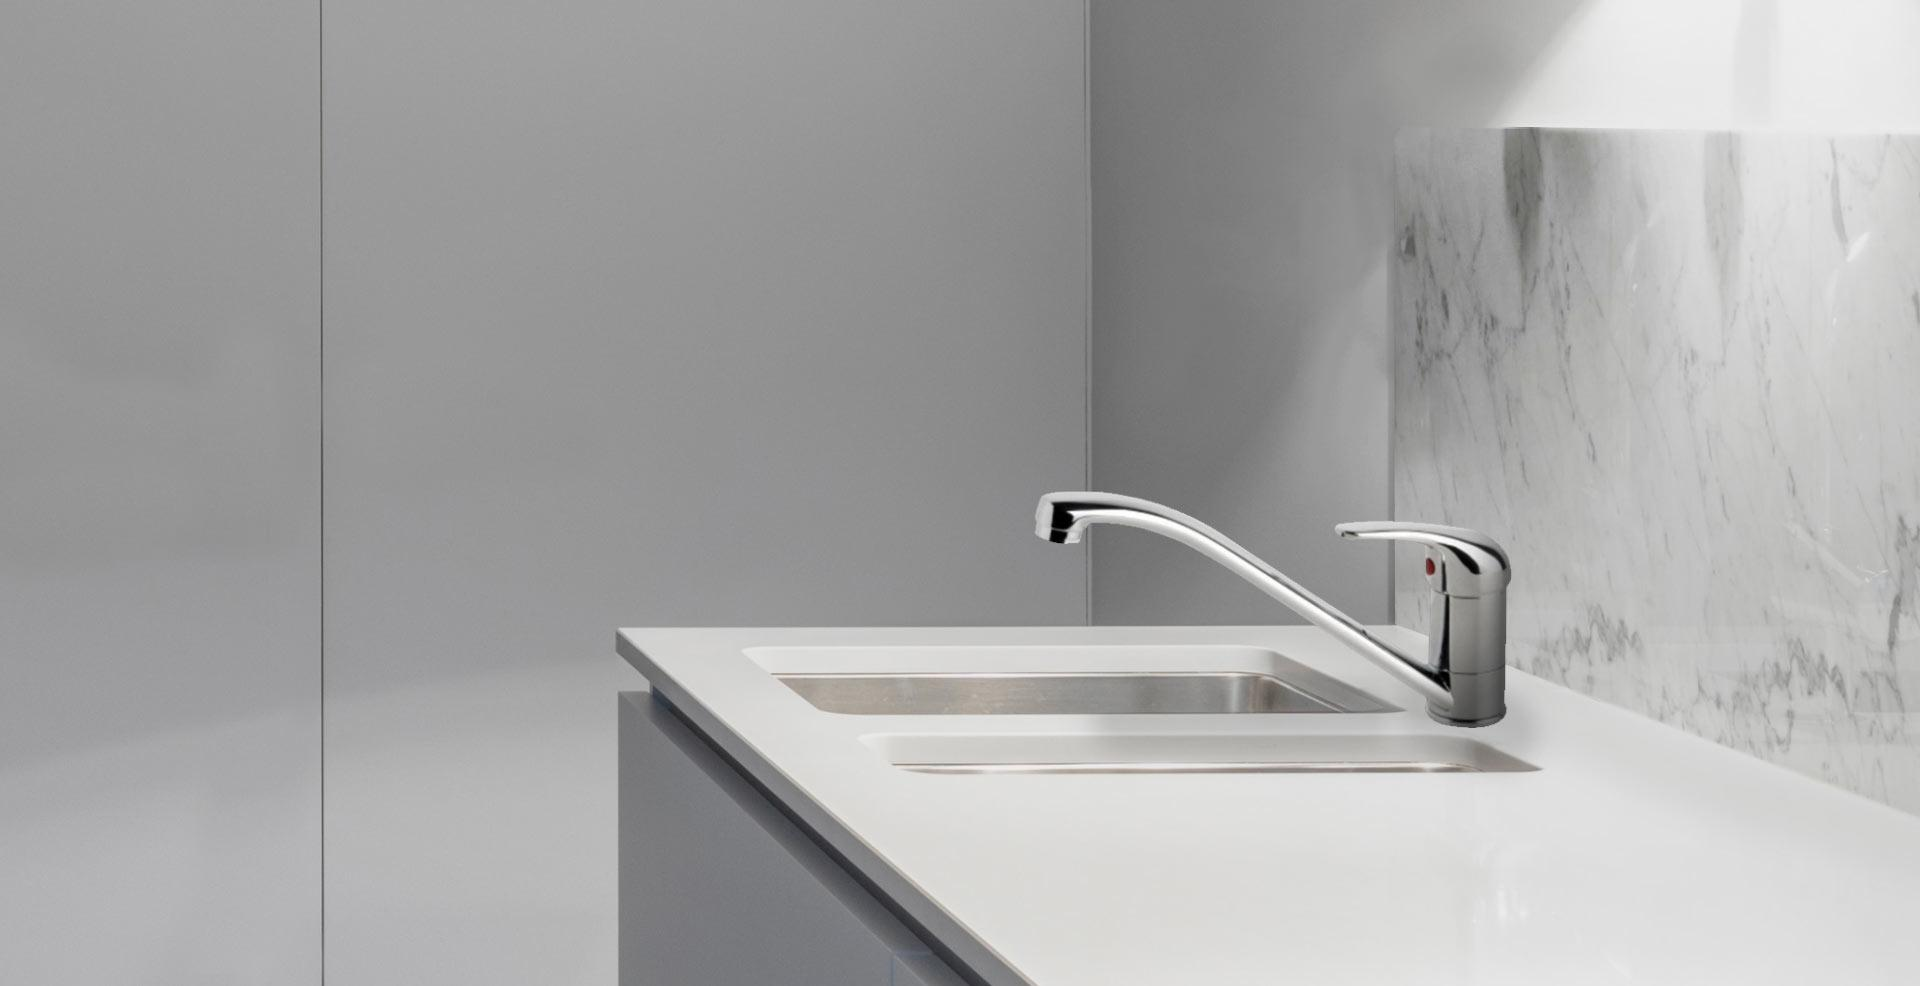 Australian Made Slimline Sink Mixer